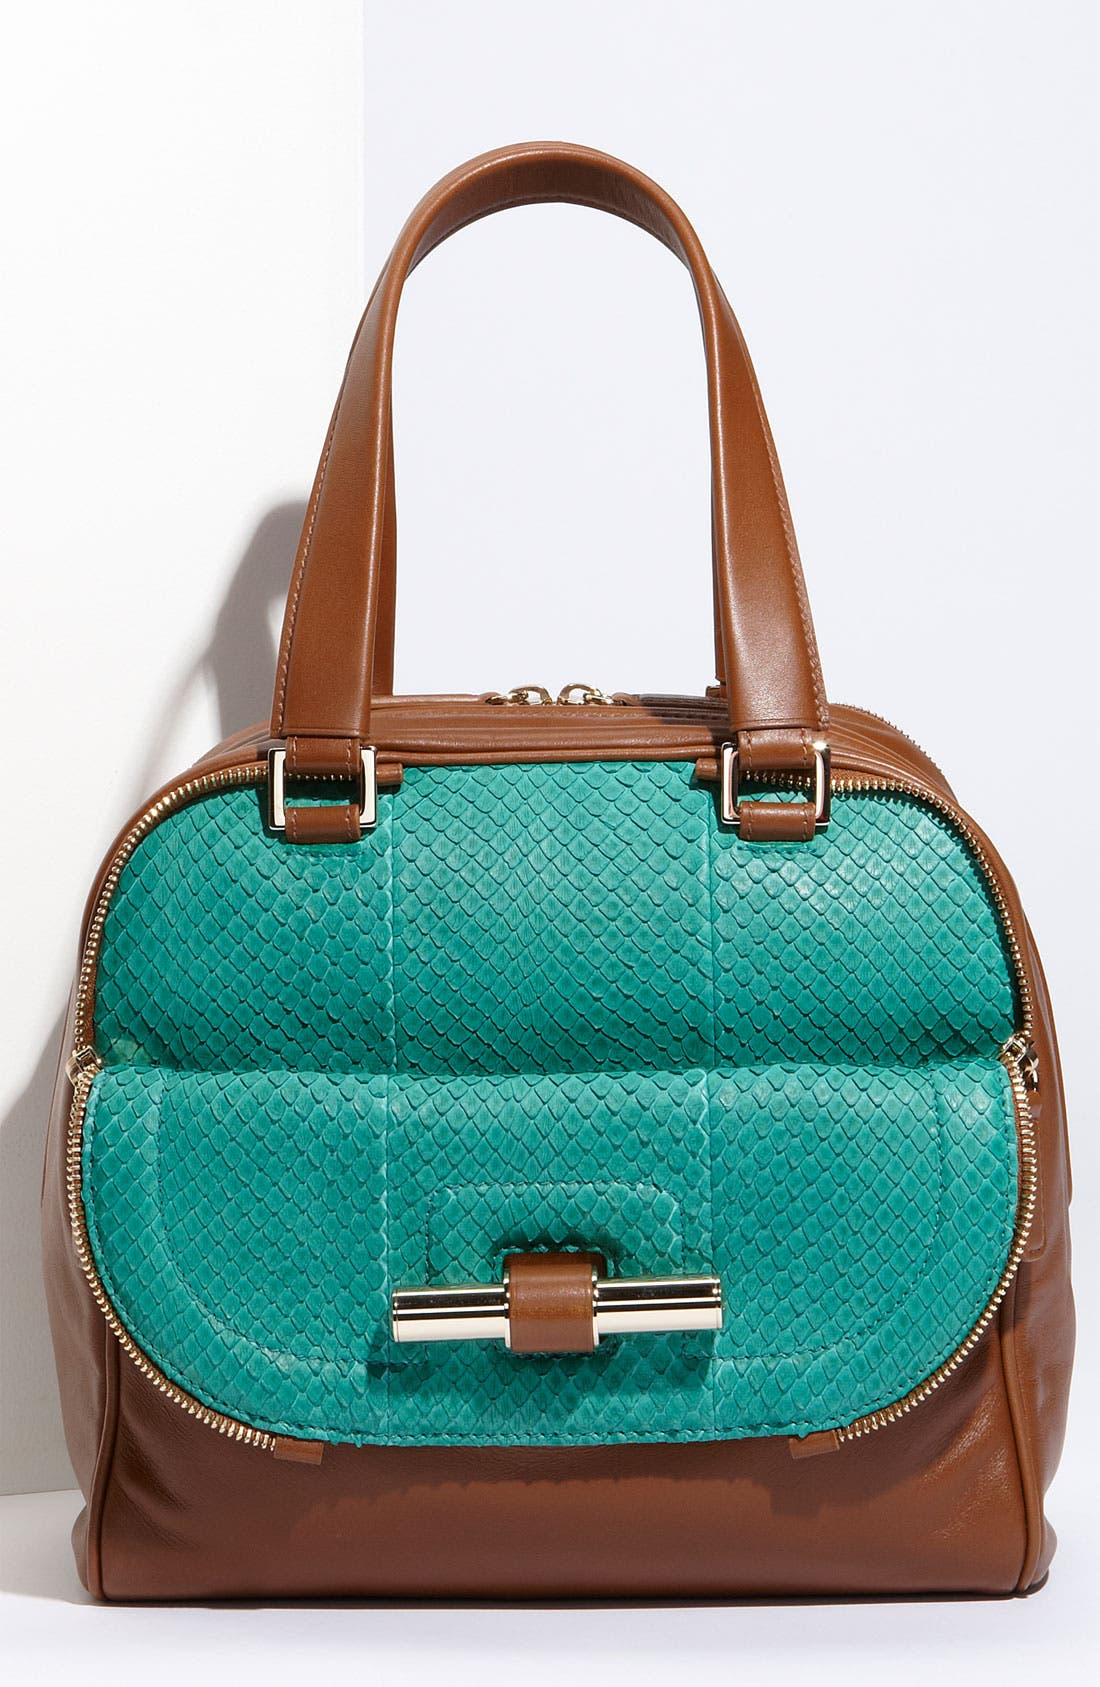 Main Image - Jimmy Choo 'Justine - Small' Leather & Genuine Anaconda Satchel